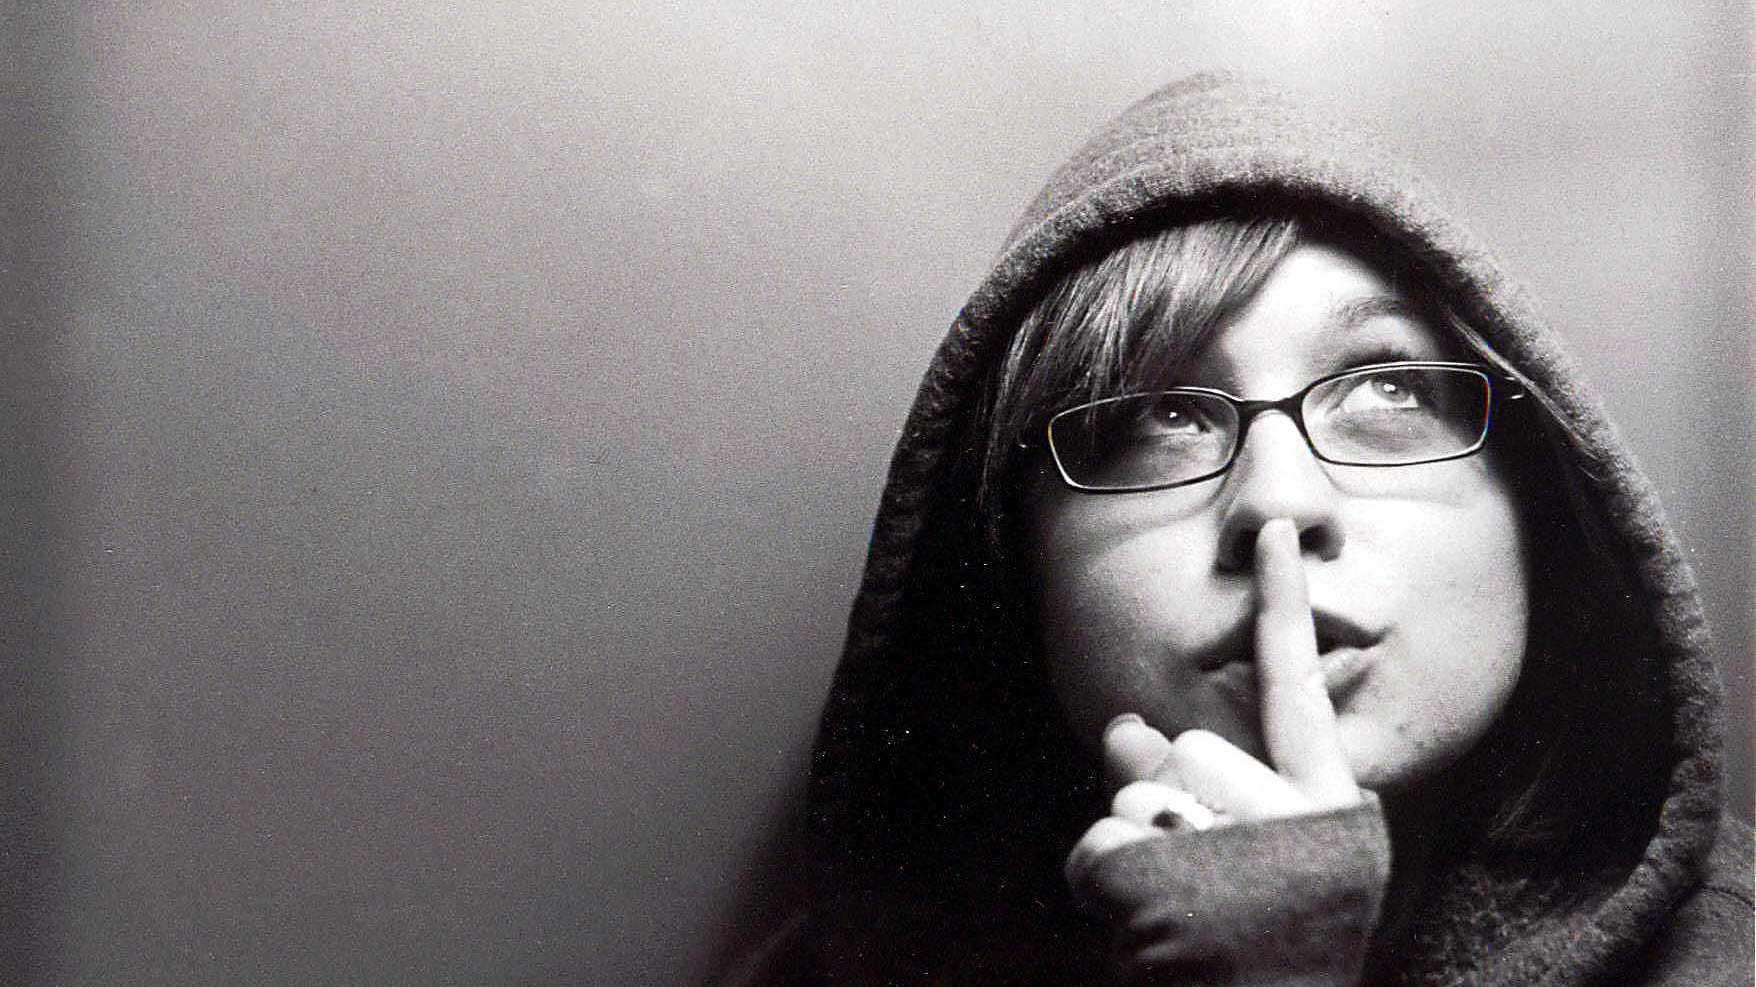 Frau mit Finger vor dem Mund